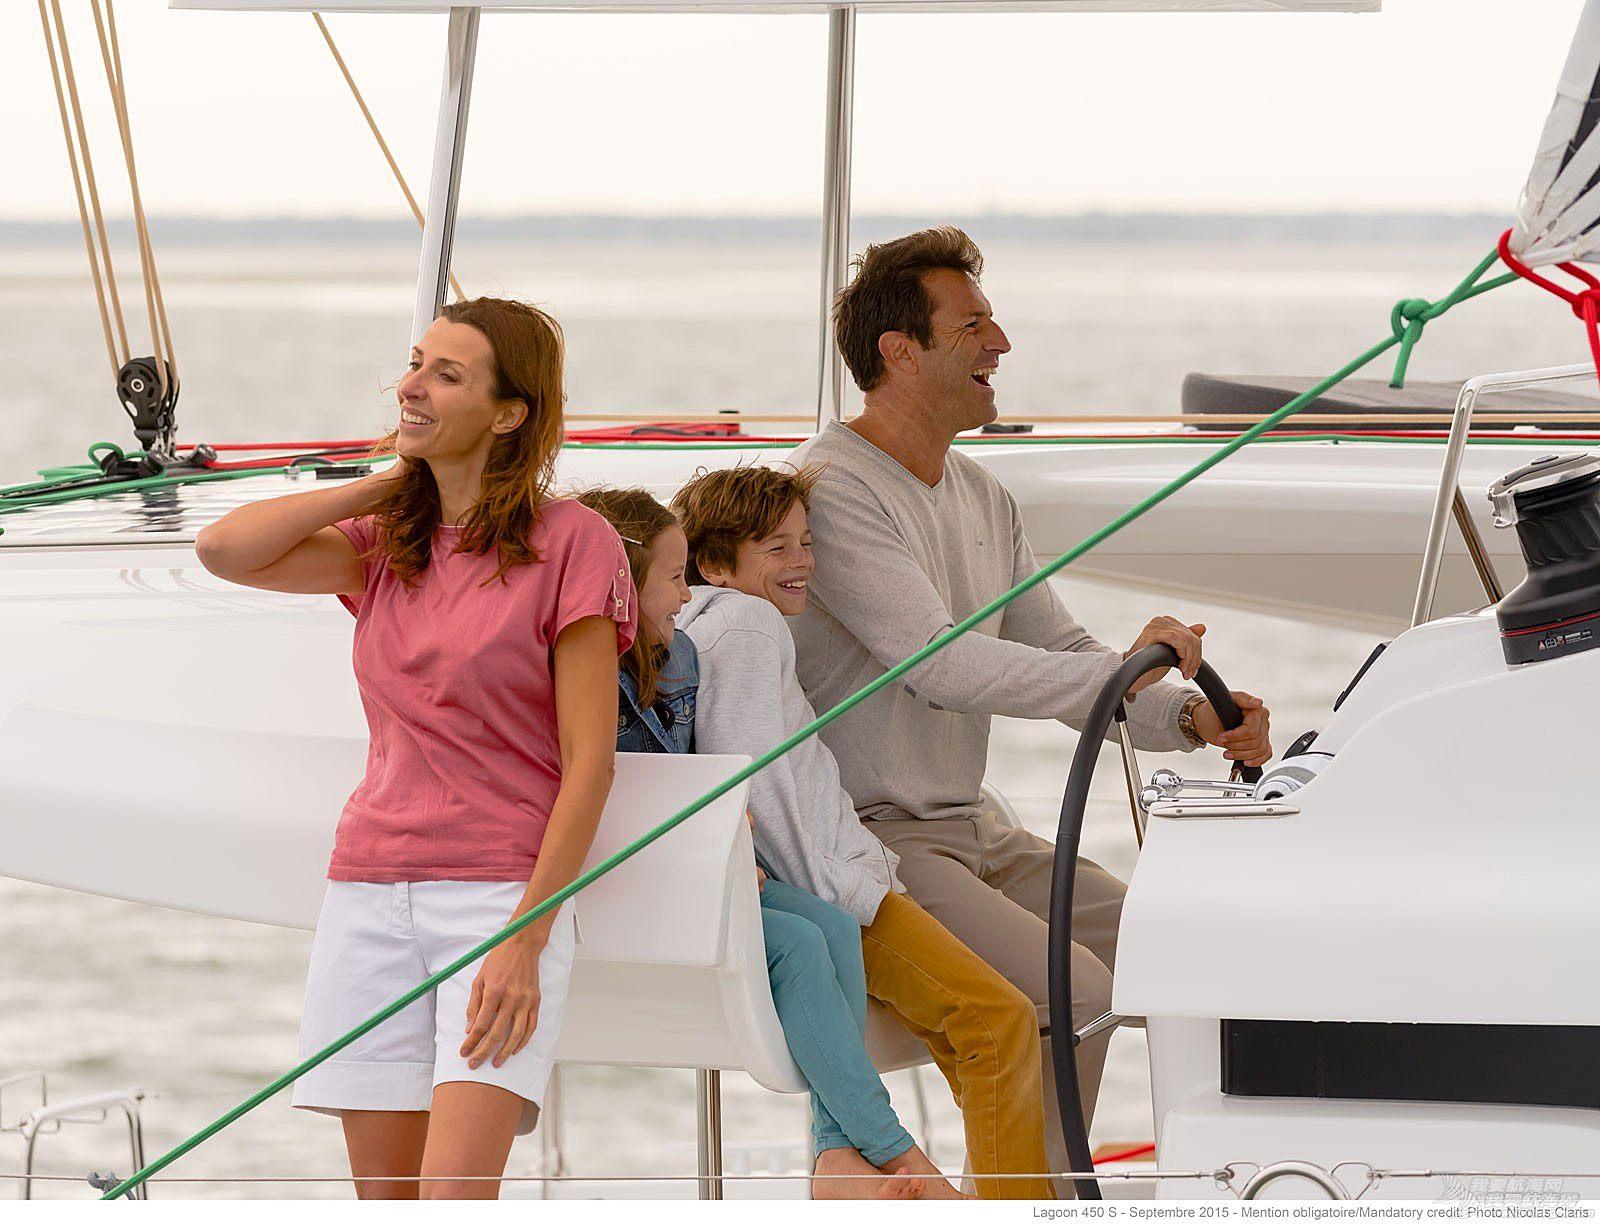 帆船 lagoon 450S 蓝高450S双体帆船